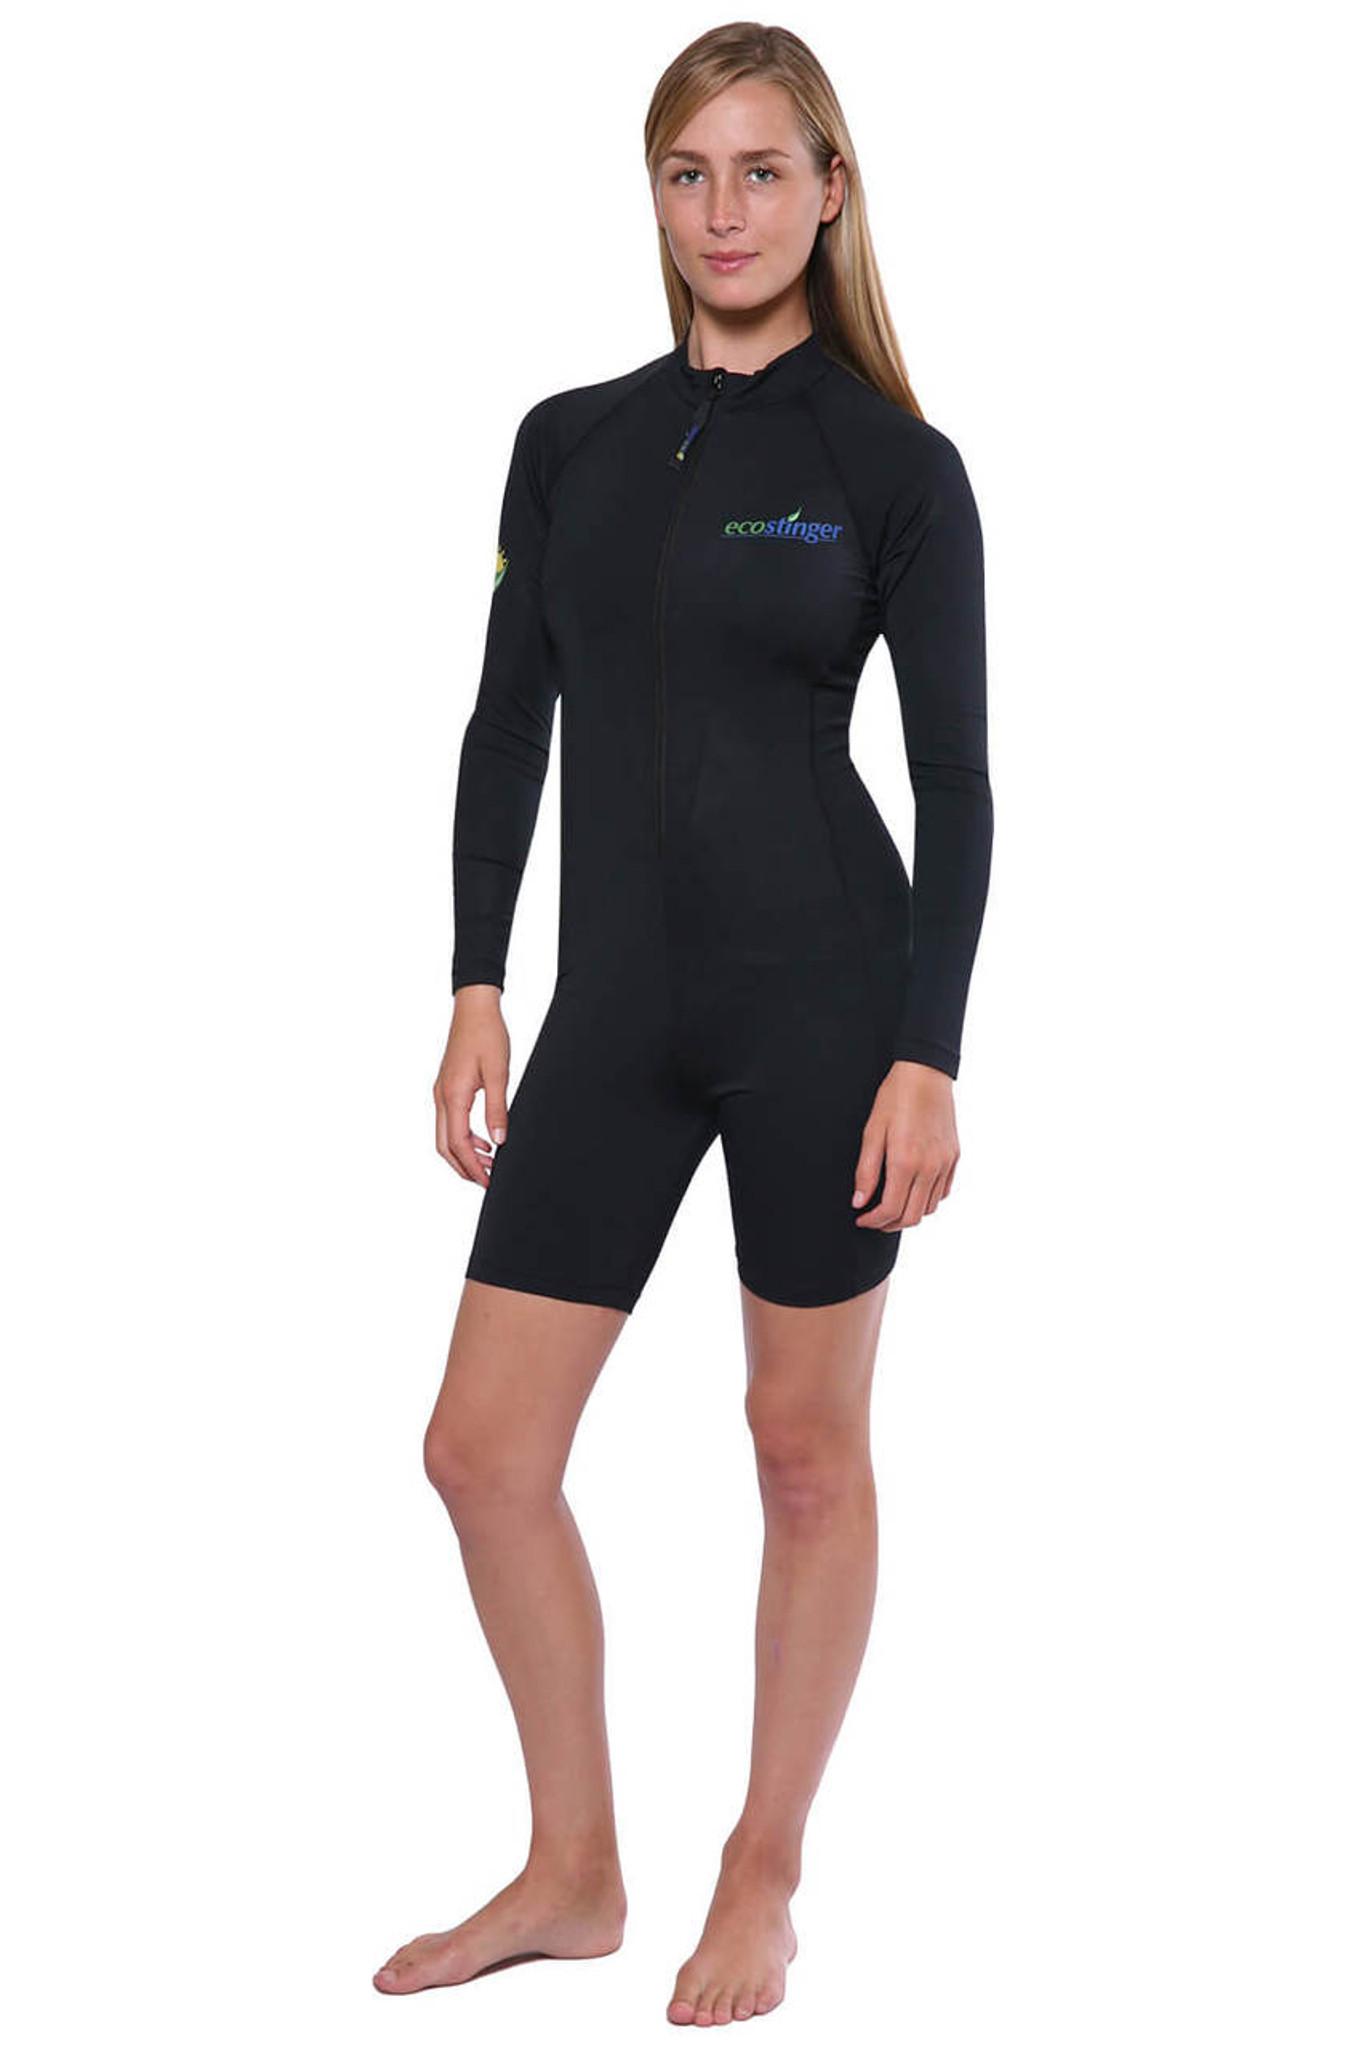 36ffce1af Women Sunsuit Bodysuit Long Sleeves UV Protection Swimwear UPF50+ Black  (Chlorine Resistant) - EcoStinger